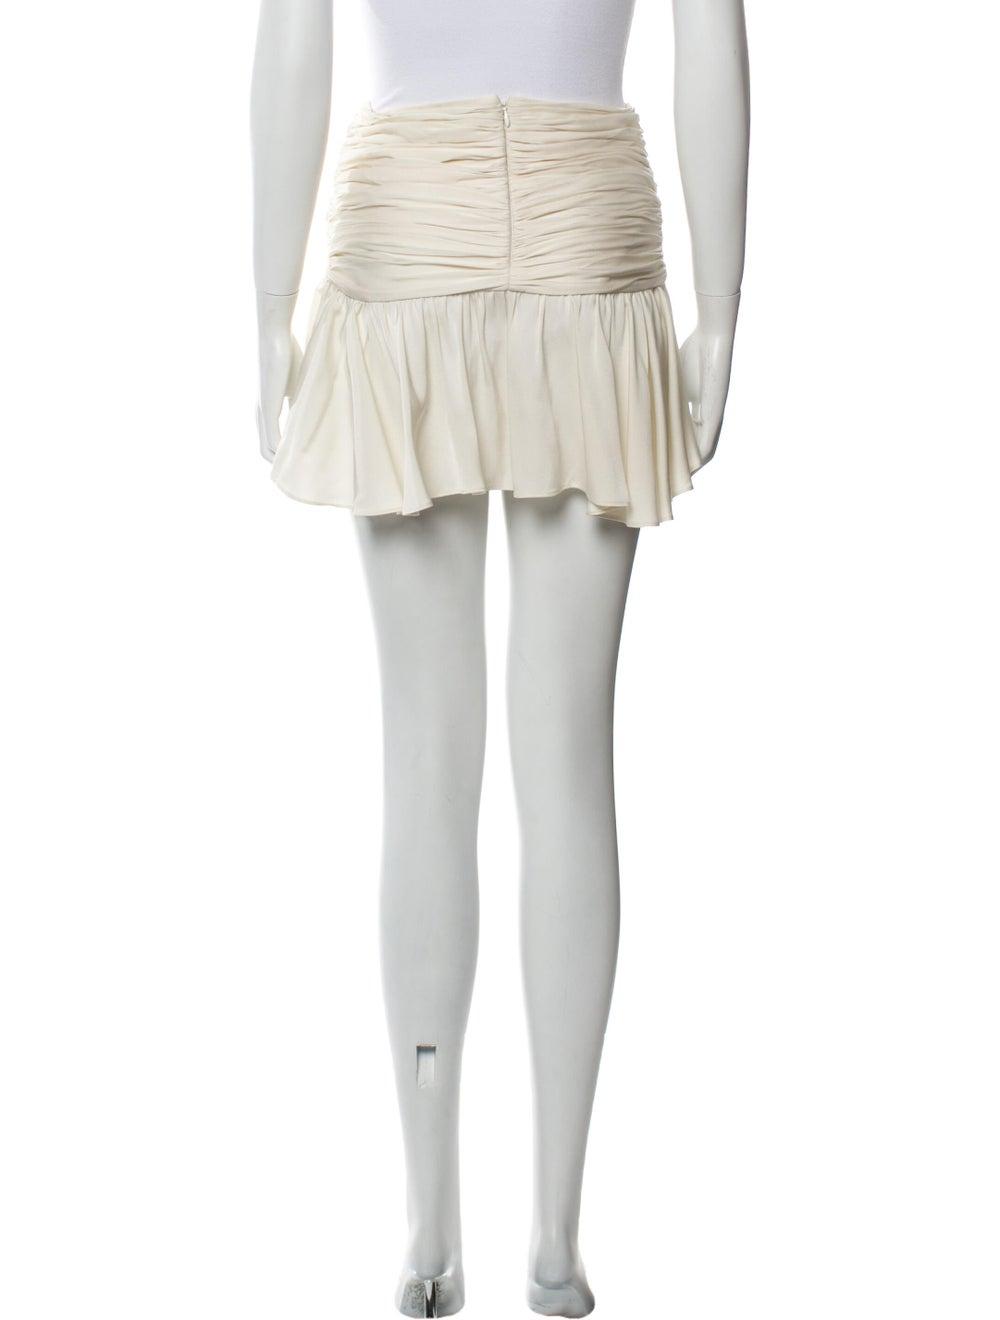 Marissa Webb Silk Mini Skirt - image 3